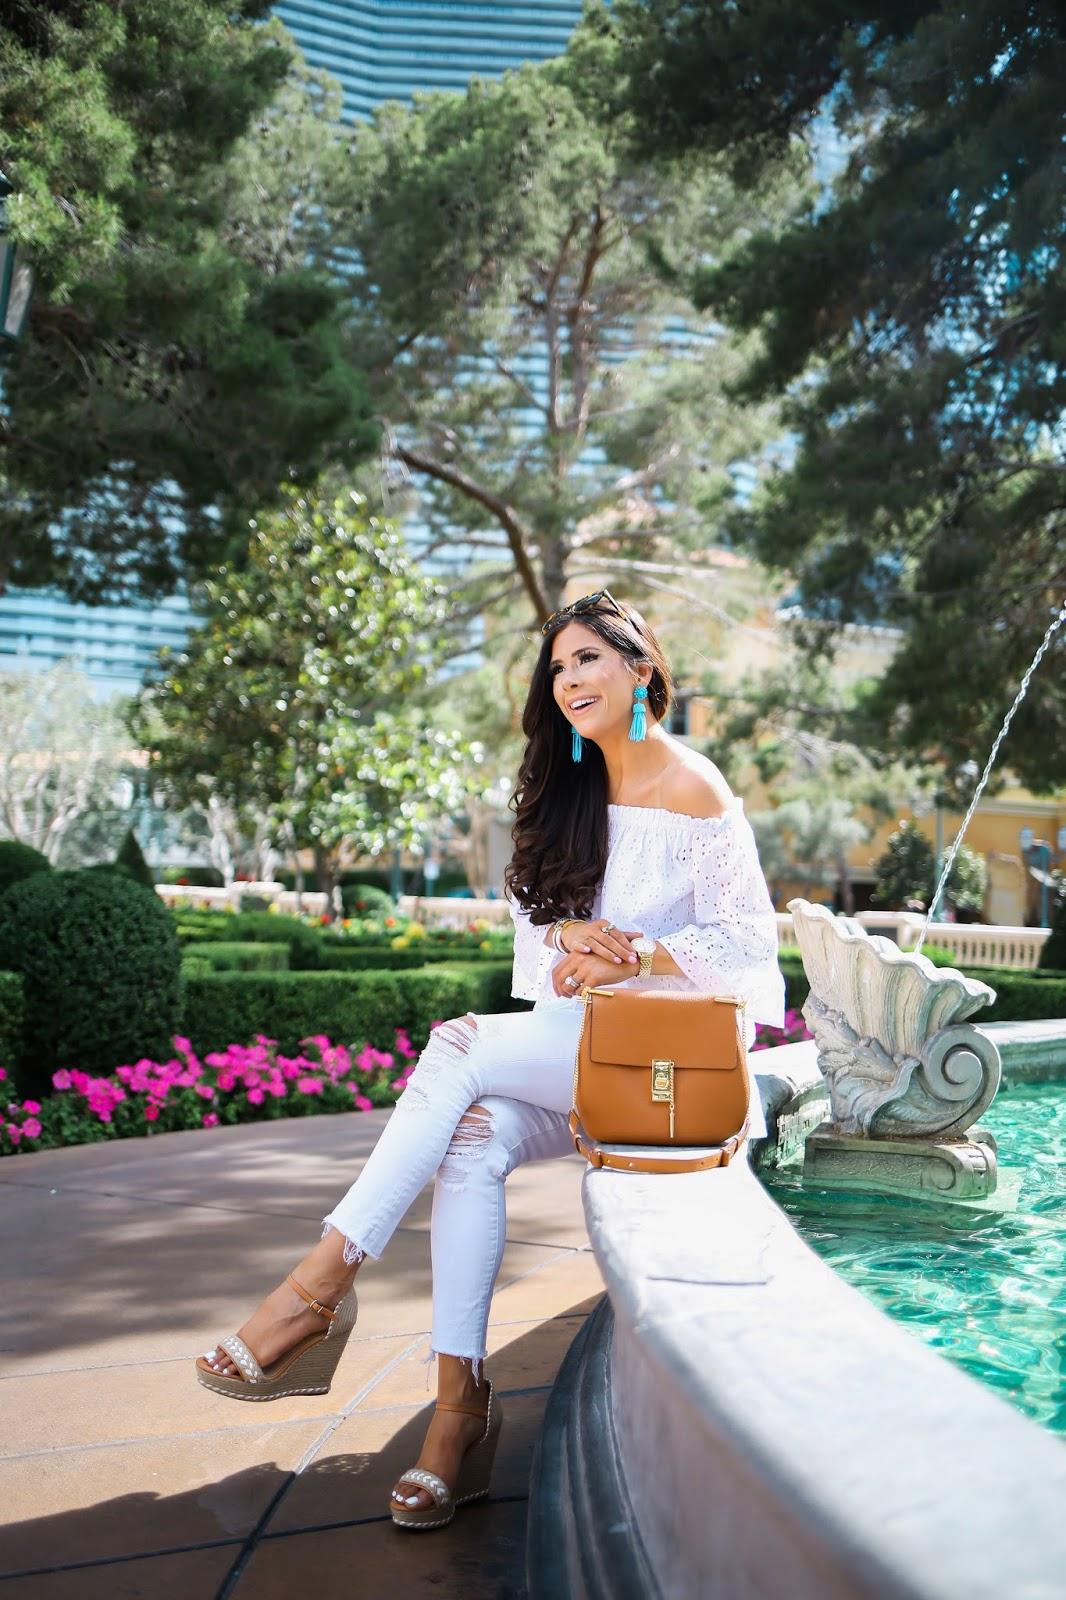 chloe cheap handbags - The Sweetest Thing �C Holford soCiety